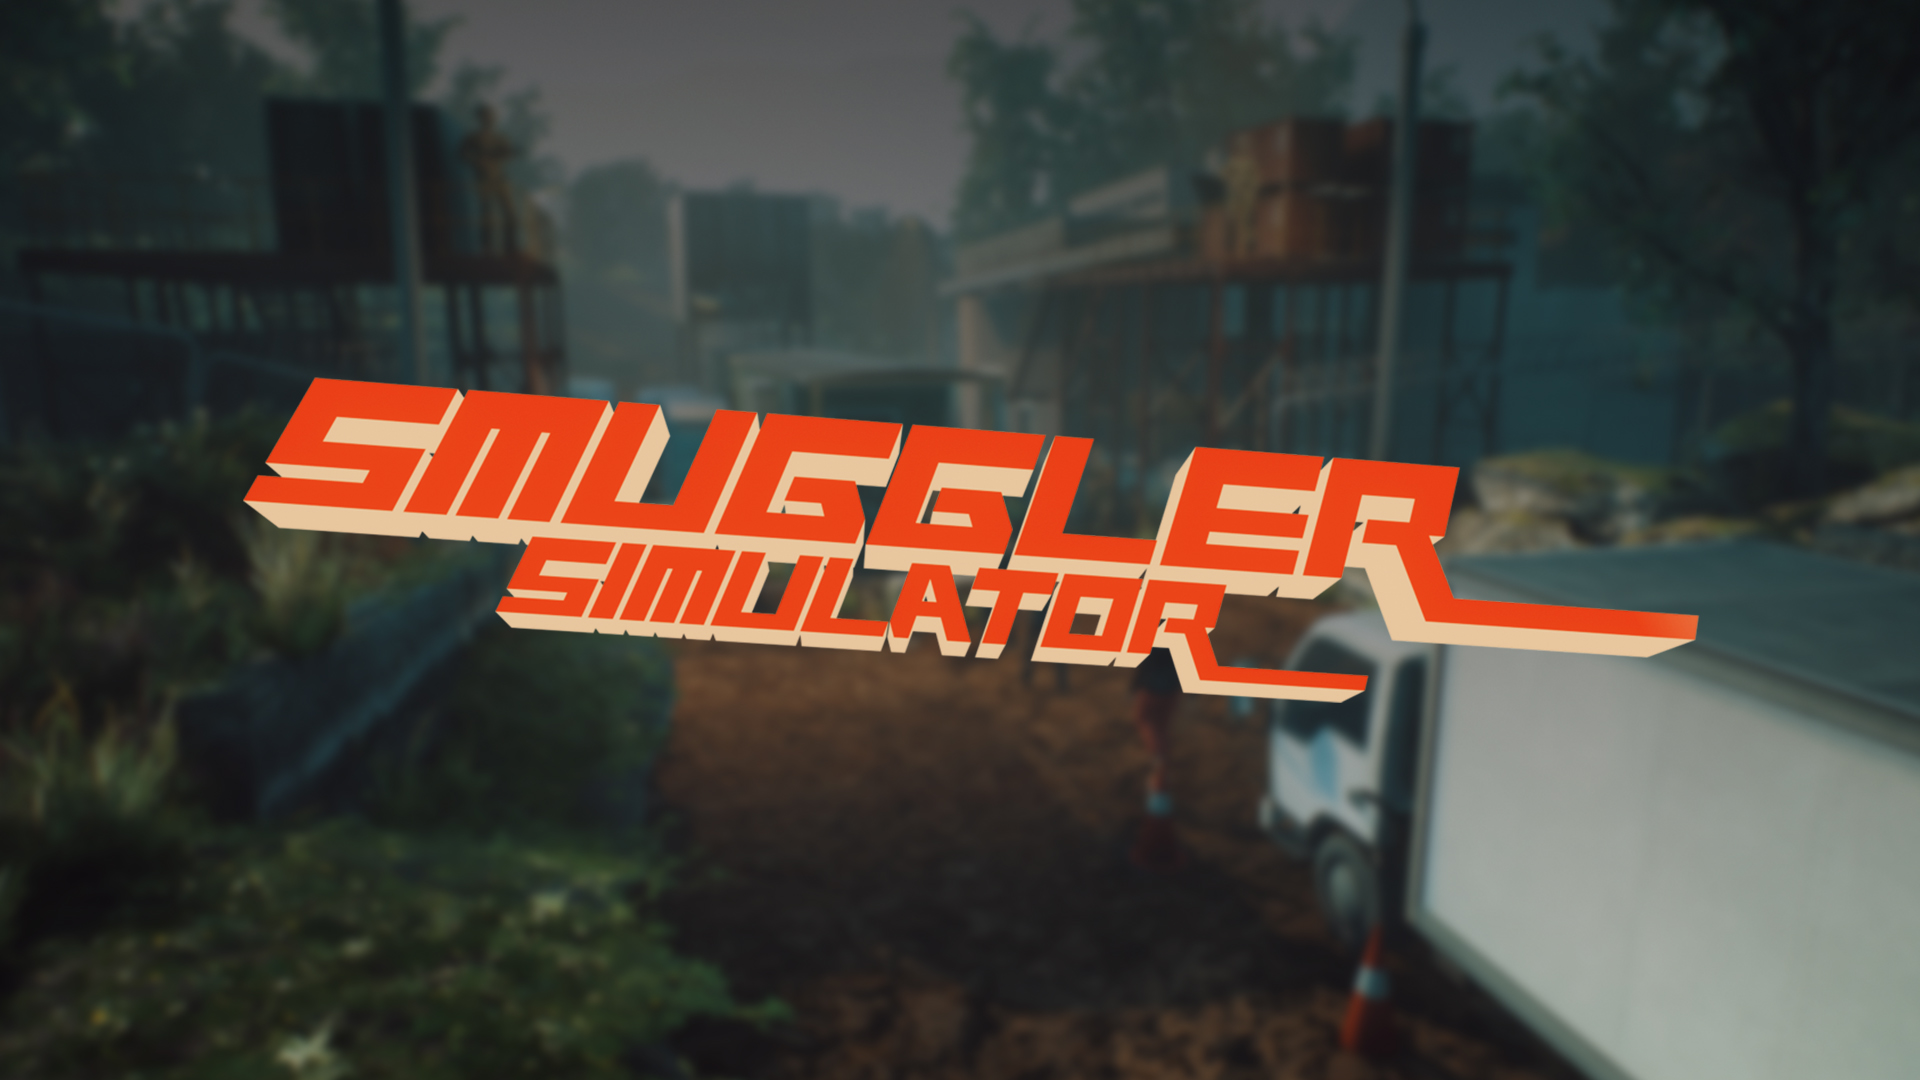 Smuggler Simulator